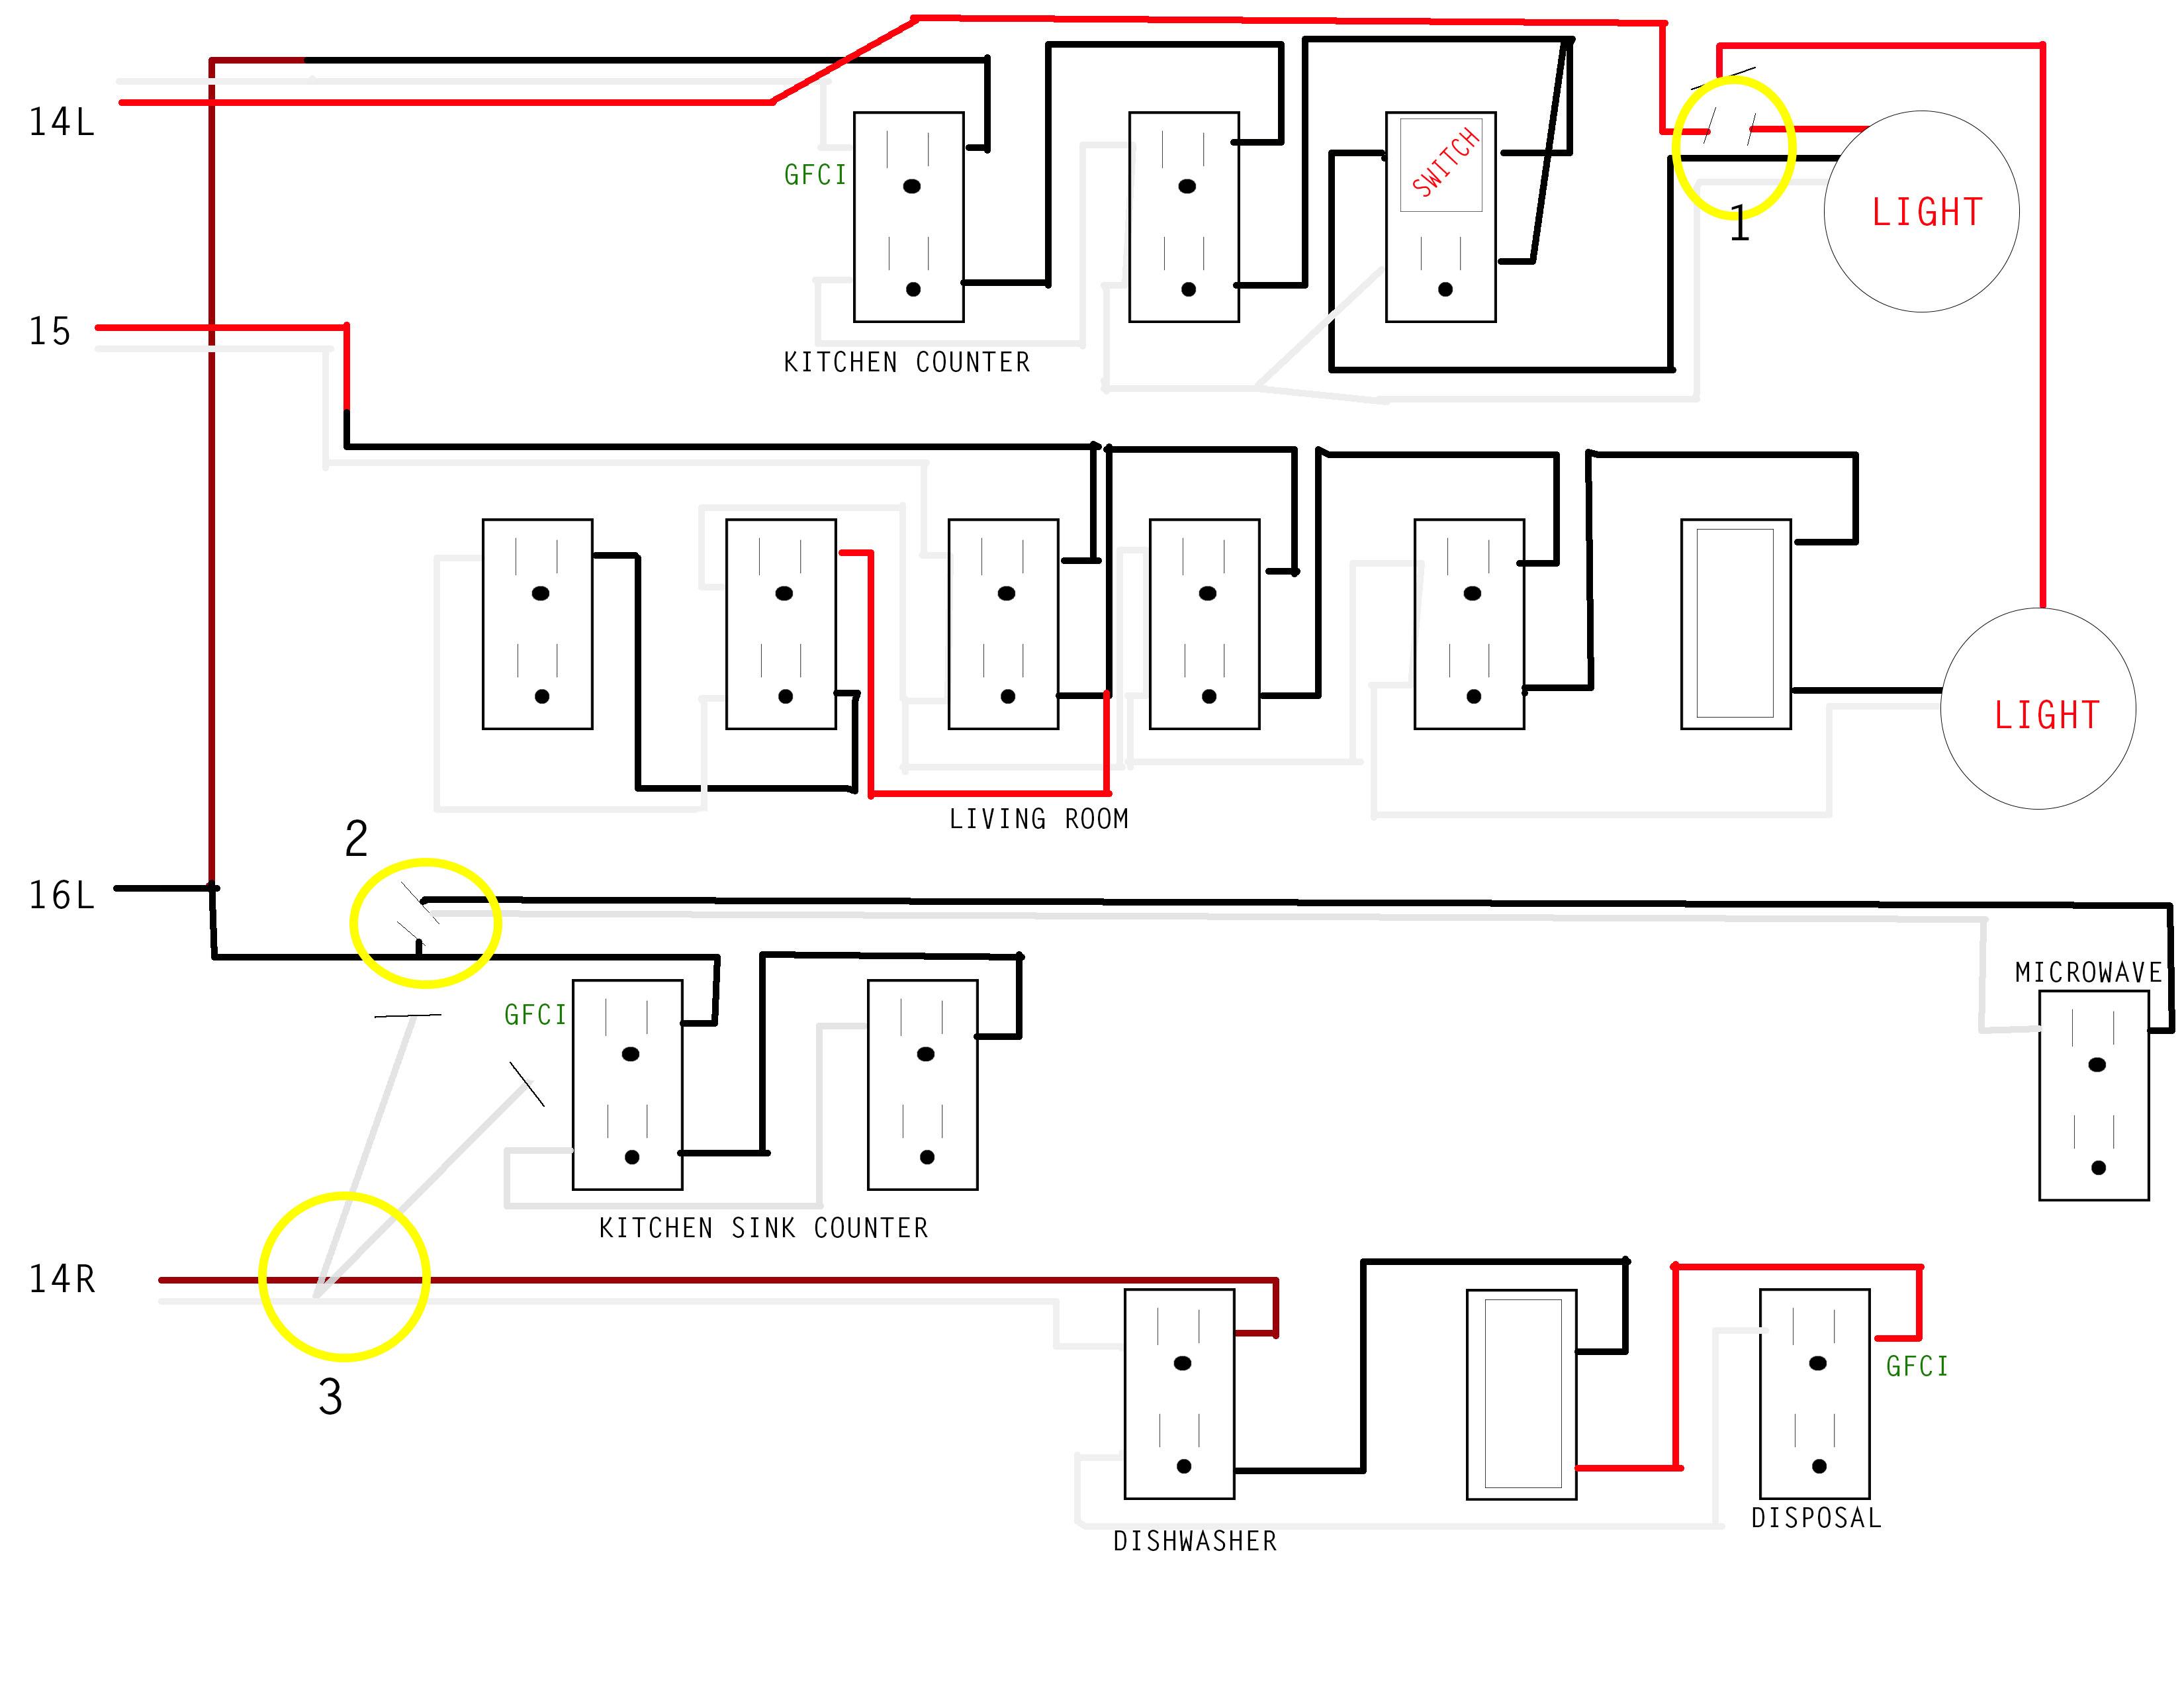 kitchen light wiring diagram goat intestines issue home improvement stack exchange